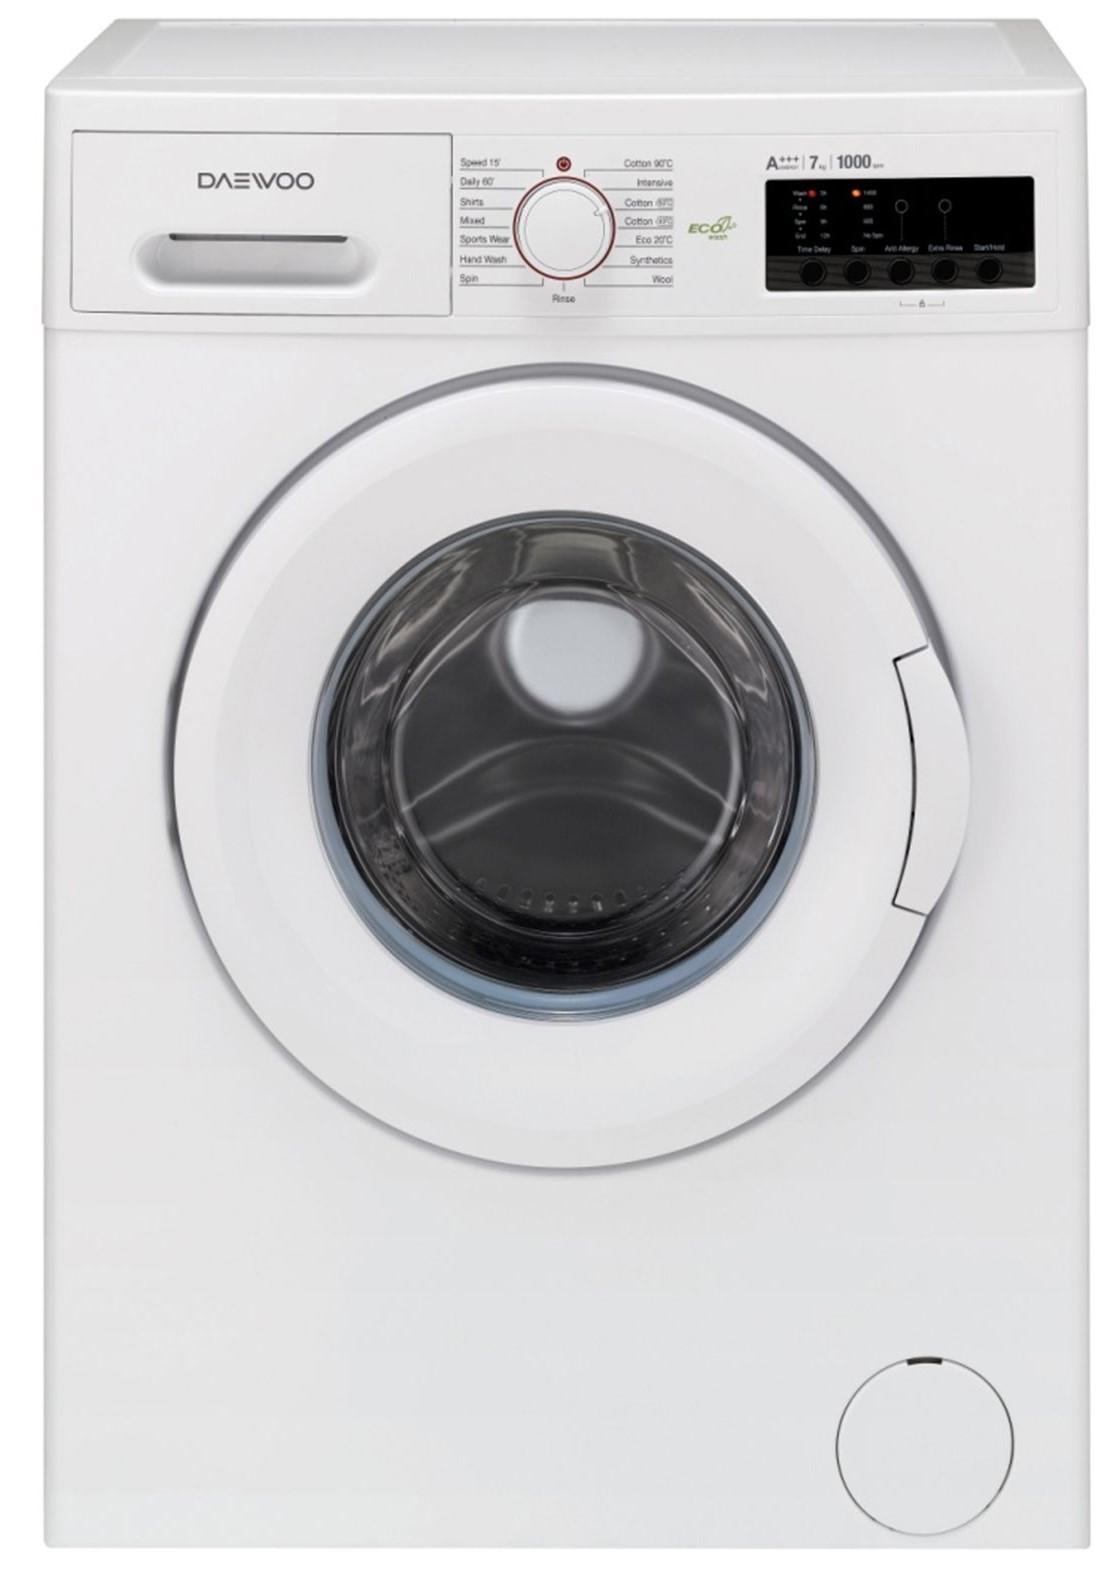 Masina de spalat rufe Daewoo DWD-FV2021-2, 7kg, A+++, Alb